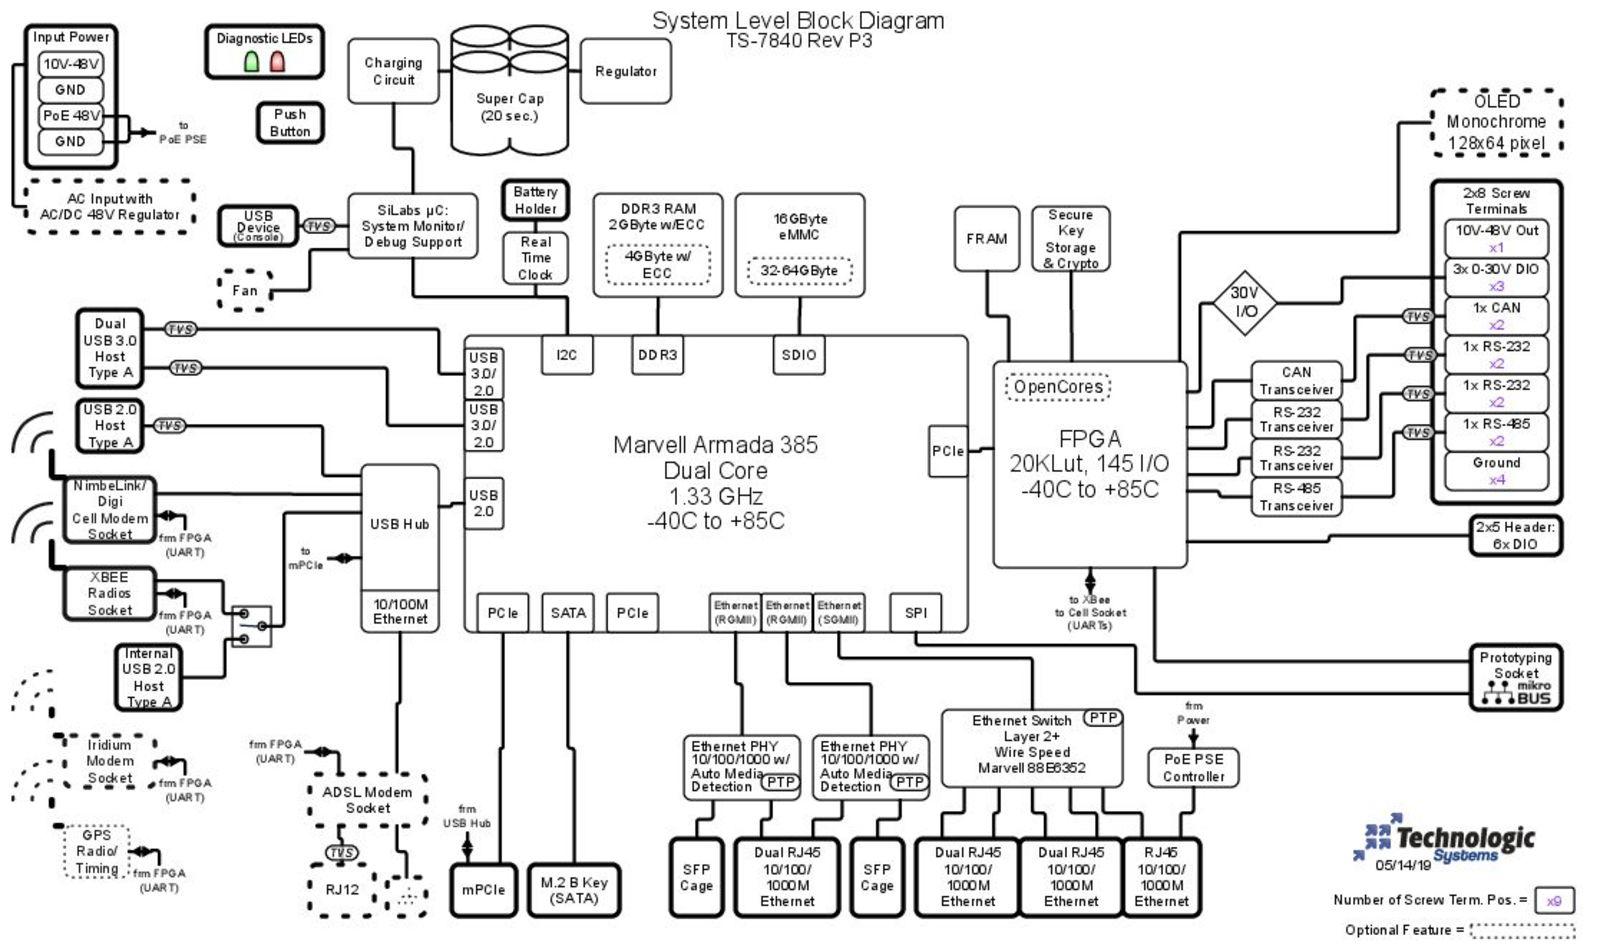 TS-7840 Block Diagram Image